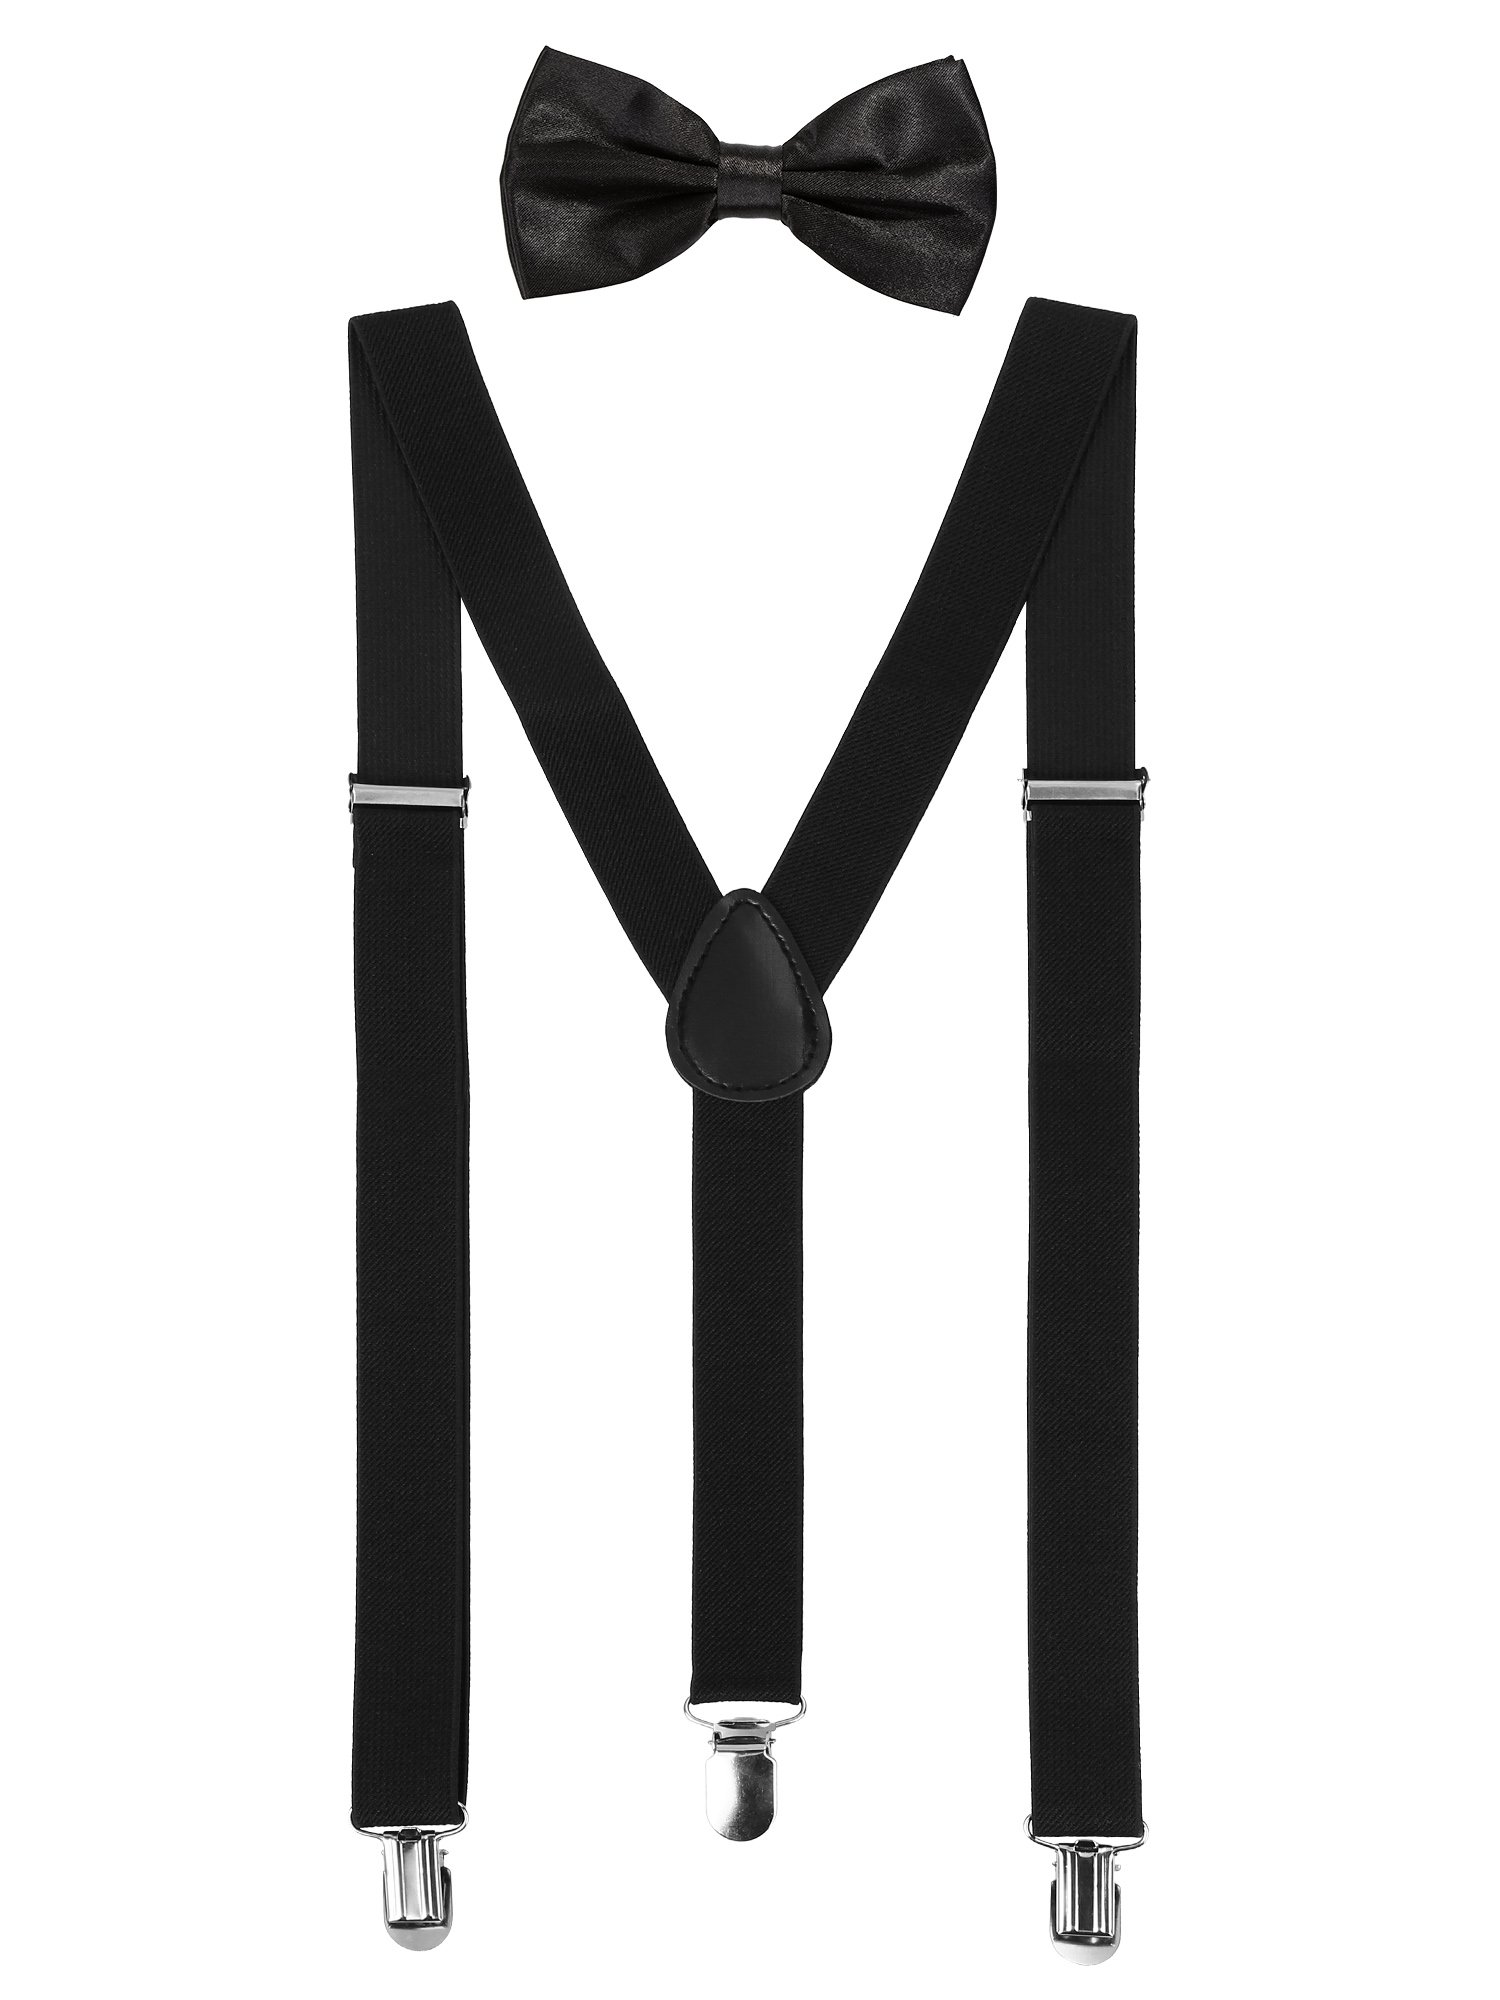 Suspender Bow Tie Set Clip On Y Shape Adjustable Braces, 80s Costume Suspenders Shoulder Straps for St. Patrick's Day